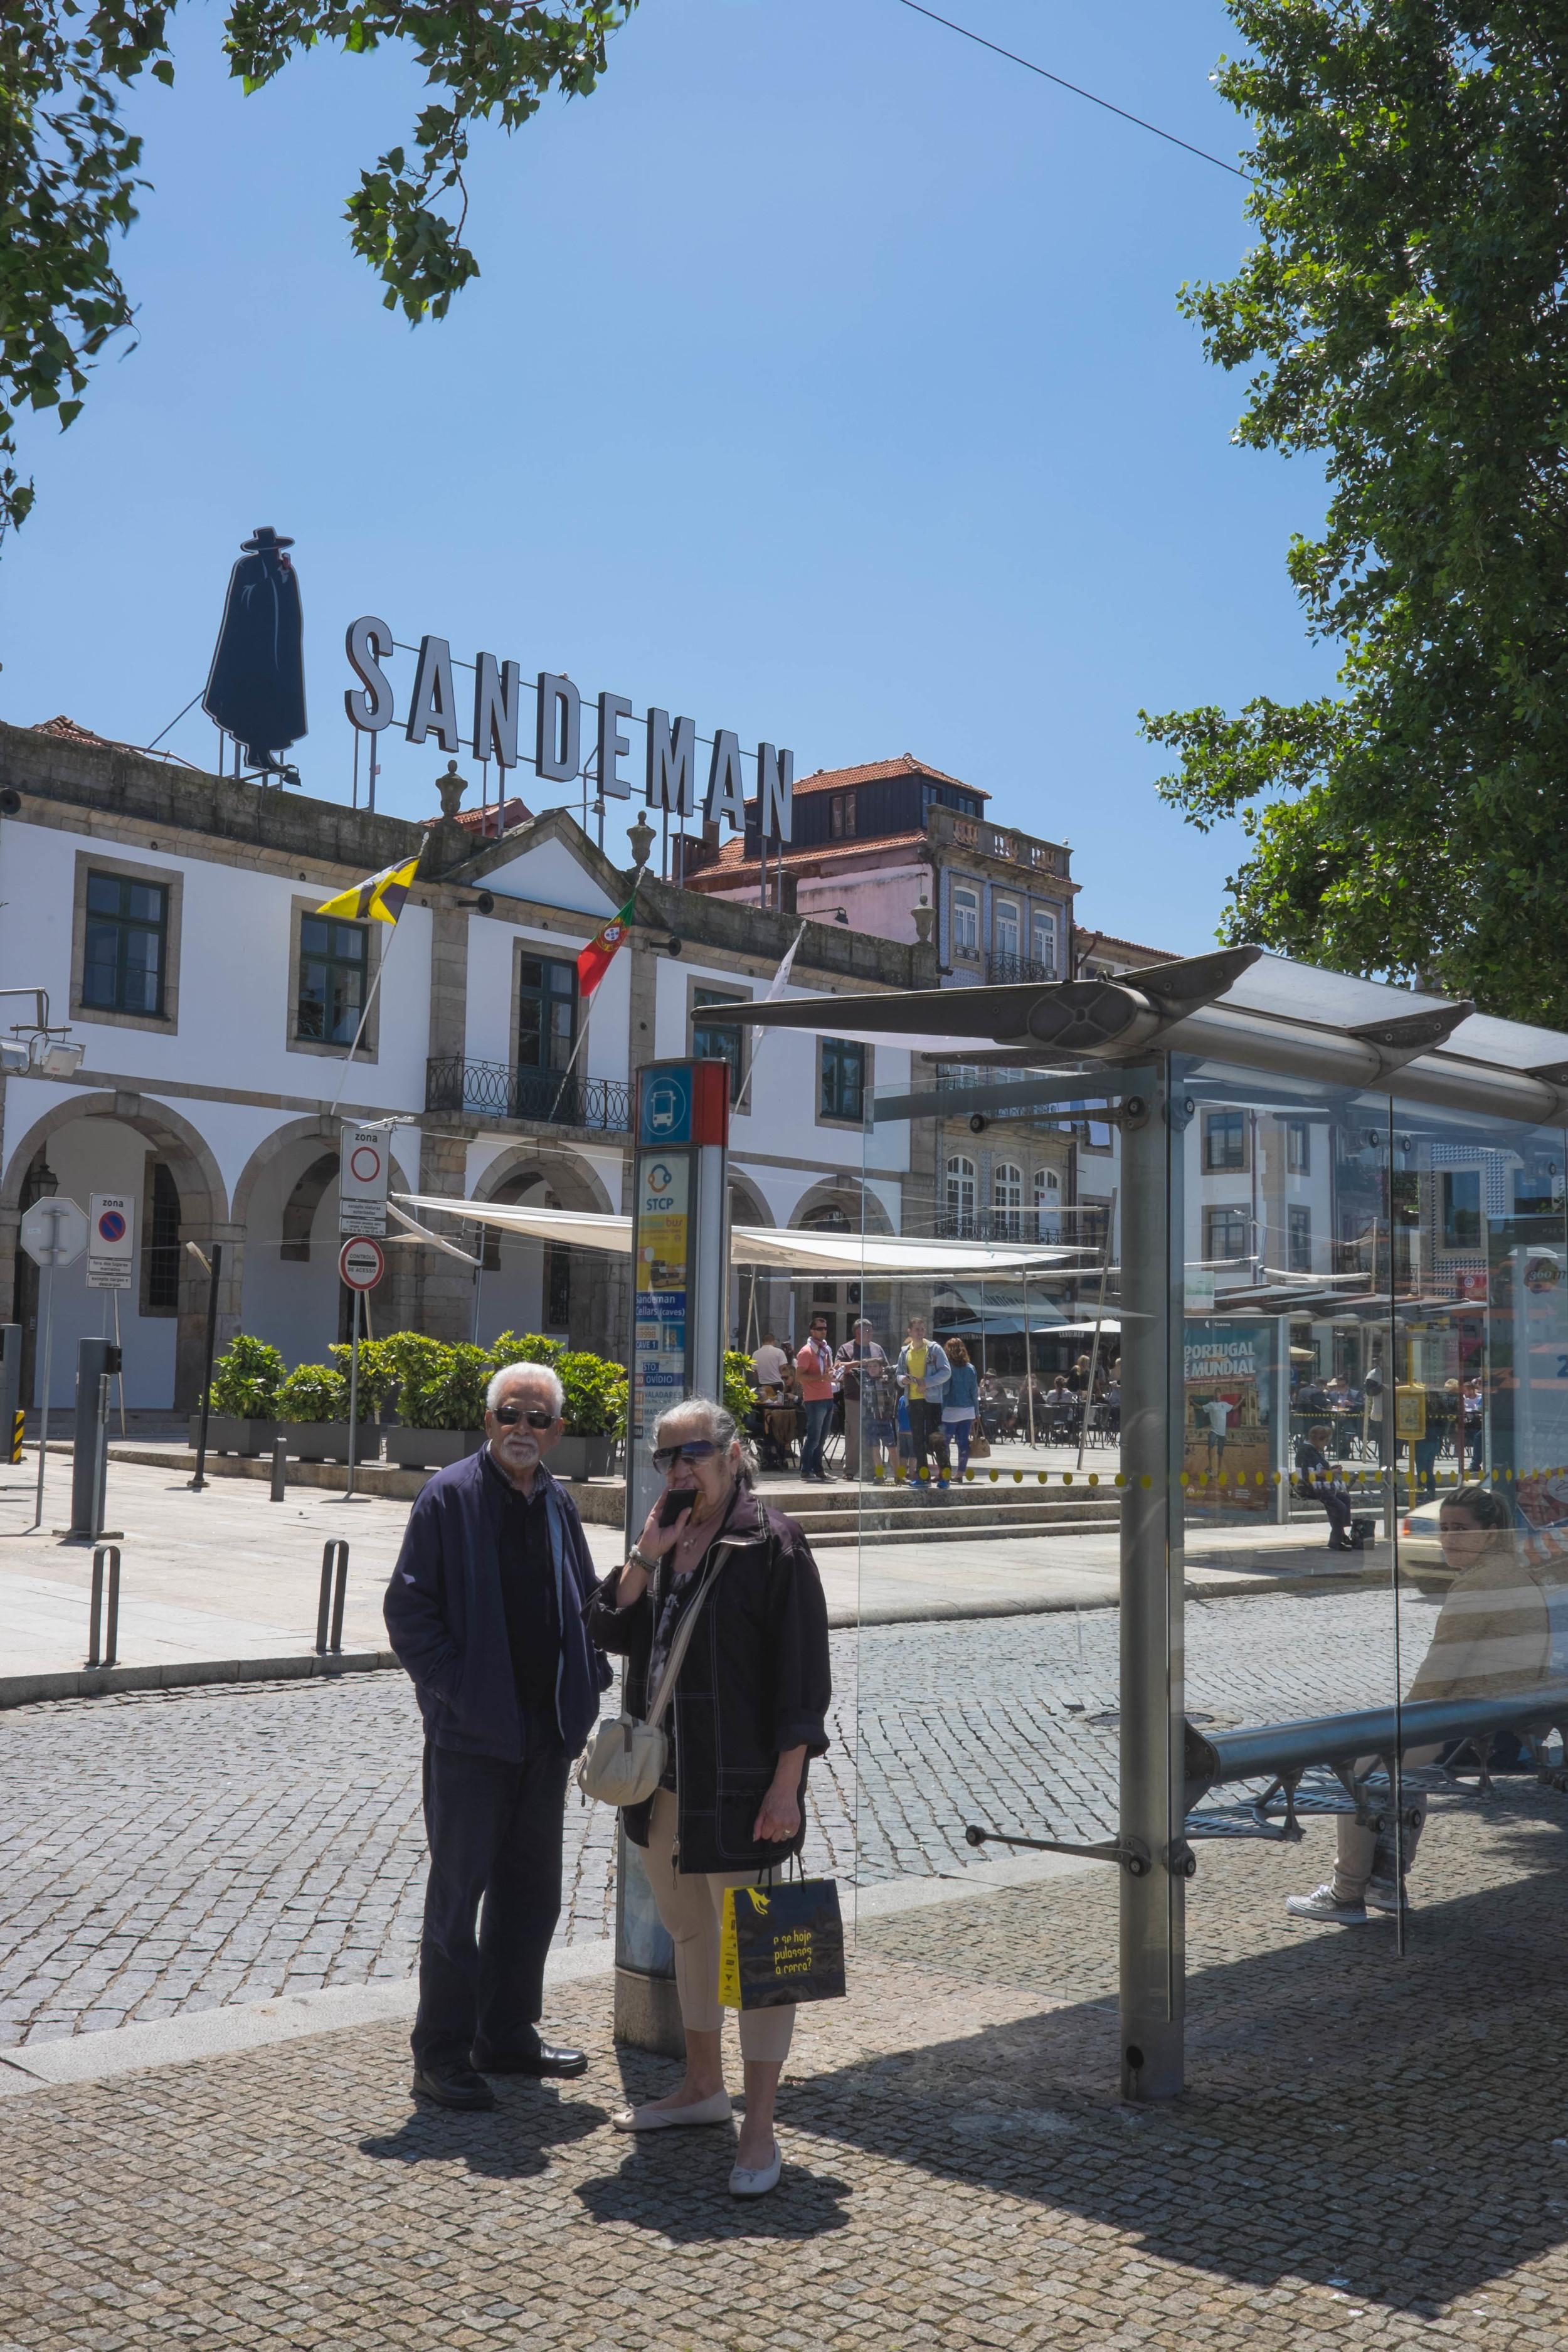 Kristen_Humbert_Philadelpia_Photographer_Travel_Editorial_Portugal-4045.jpg